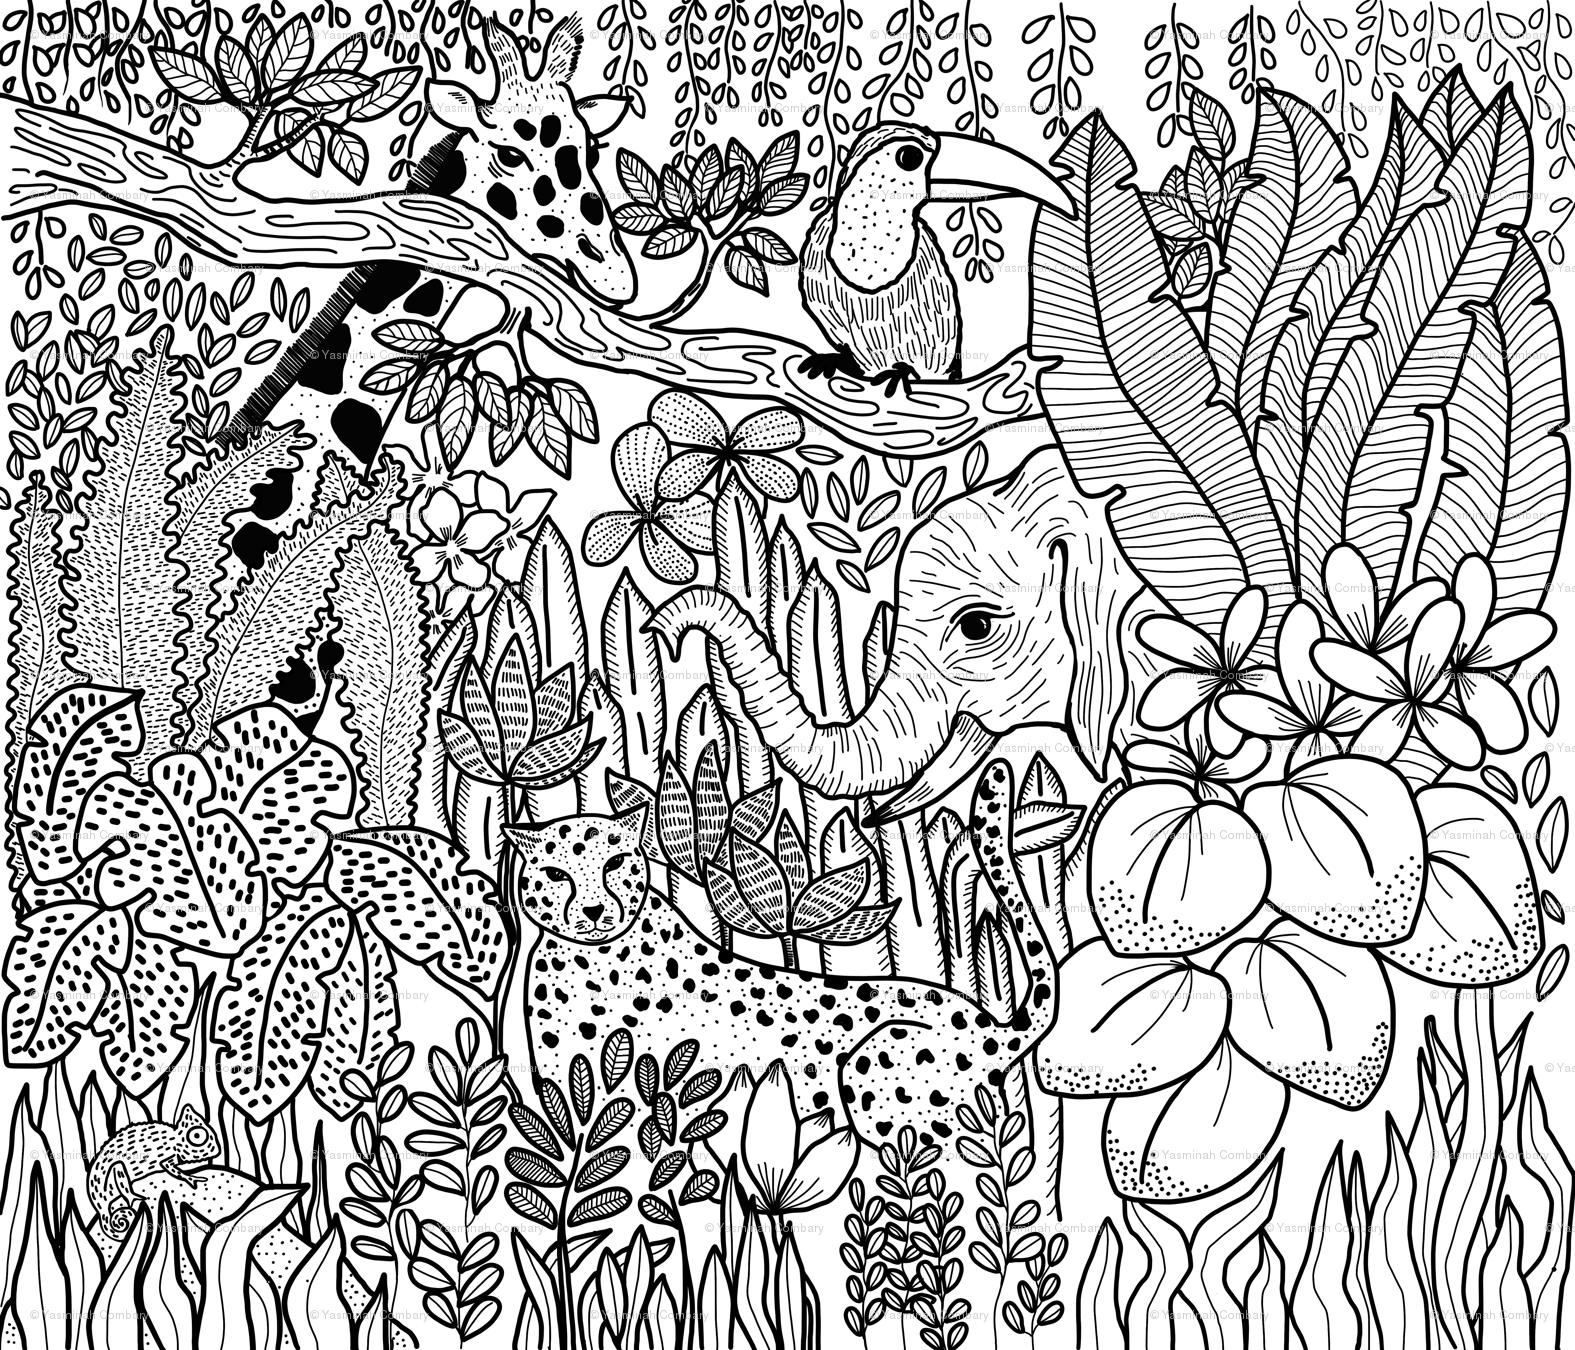 Jungle_Coloring_Book wallpaper - yasminah_combary - Spoonflower